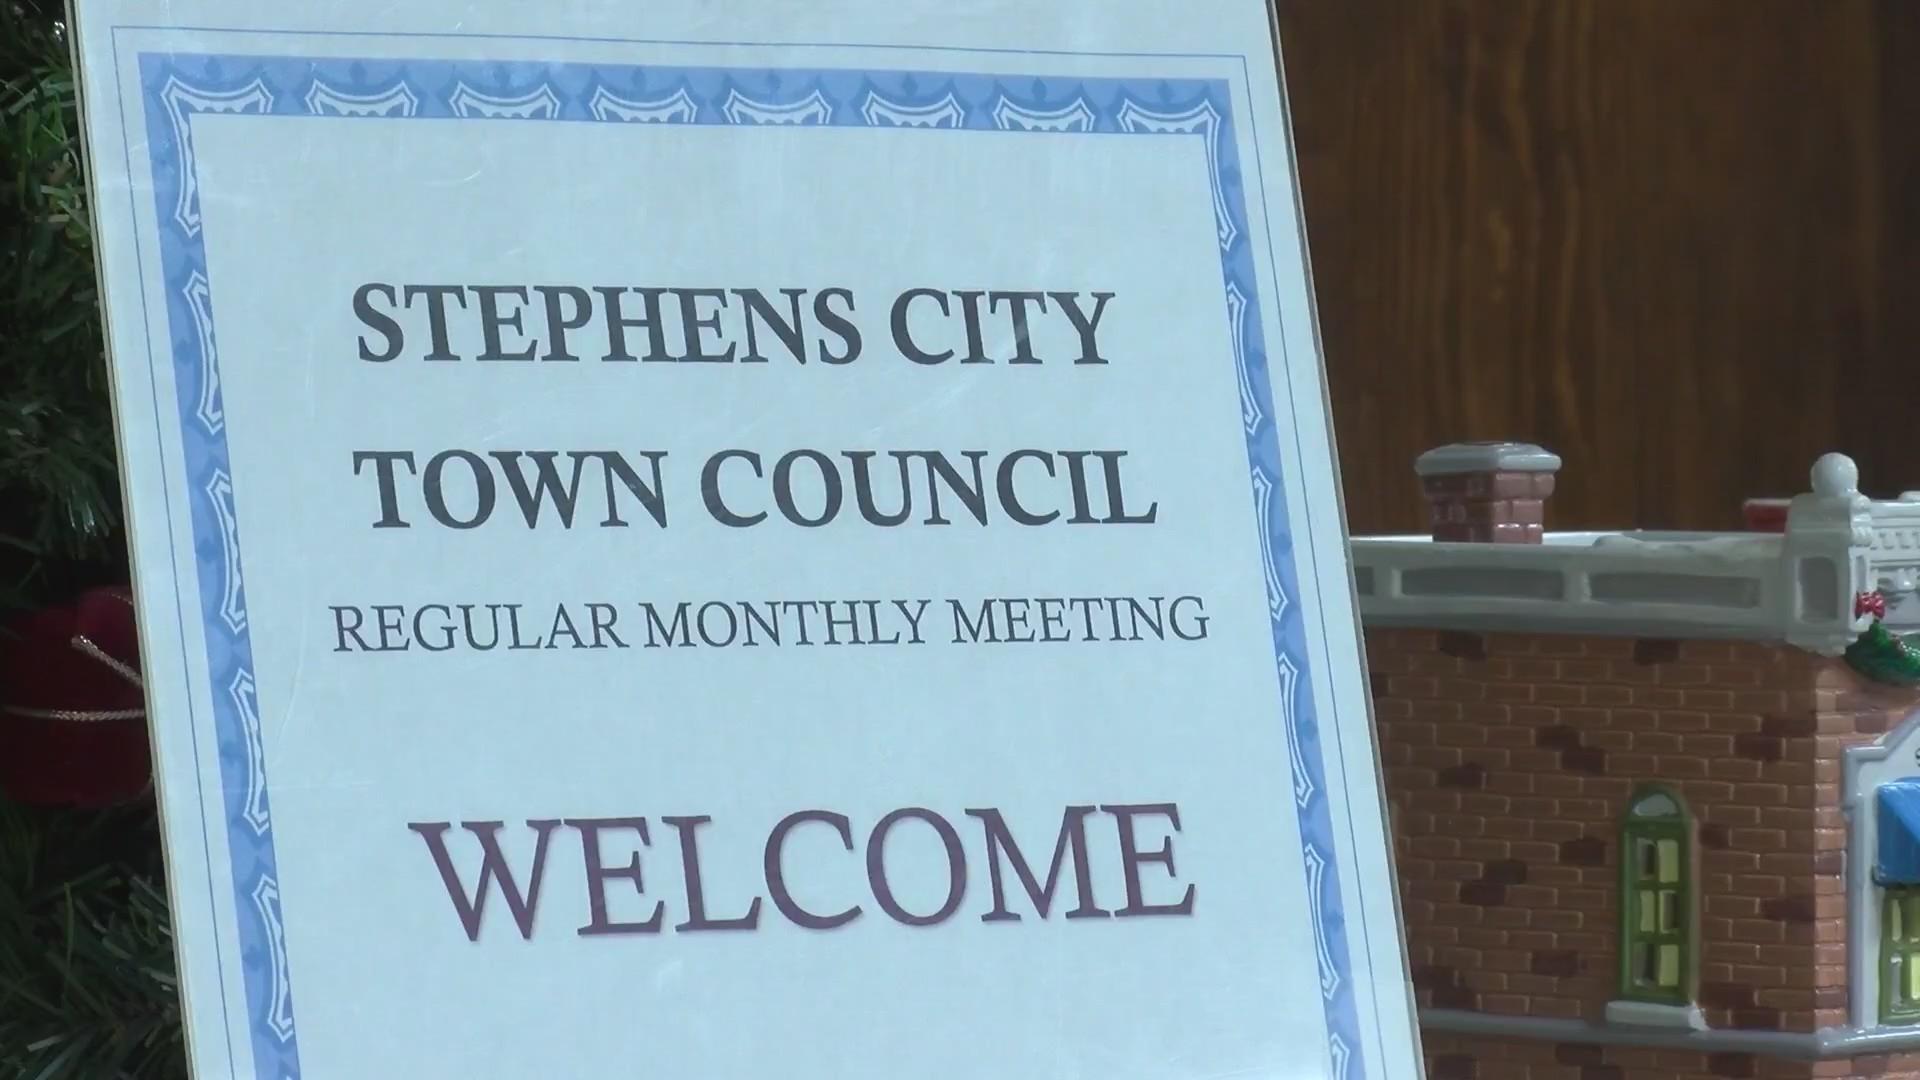 Stephens_City_Council_9_20190109033809